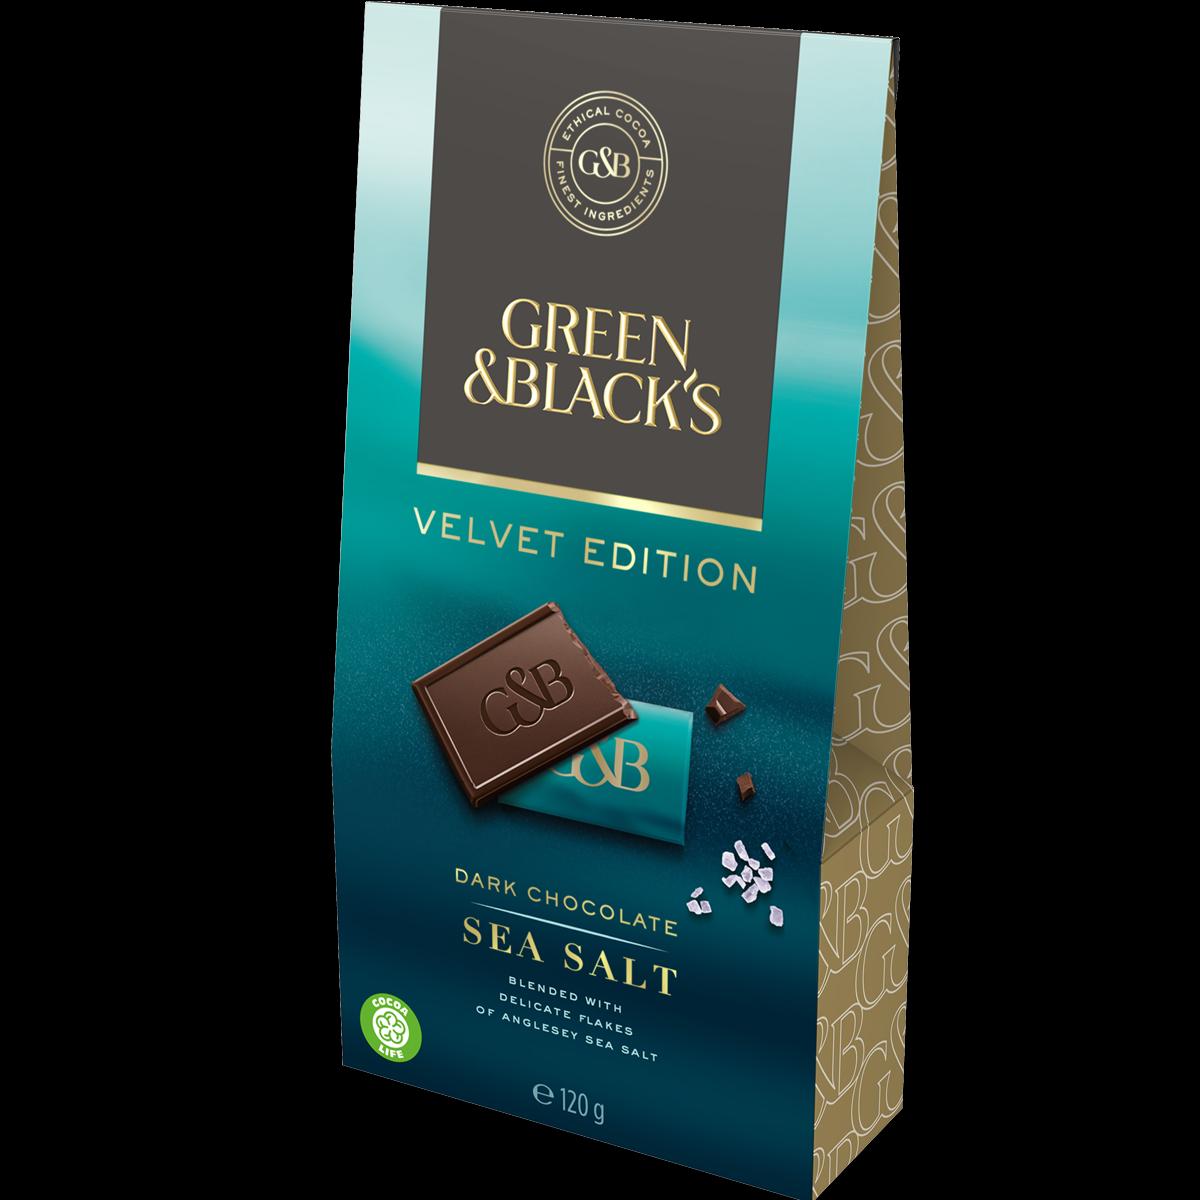 Green & Black's Dark Chocolate Sea Salt Bag 120g (Box of 5)